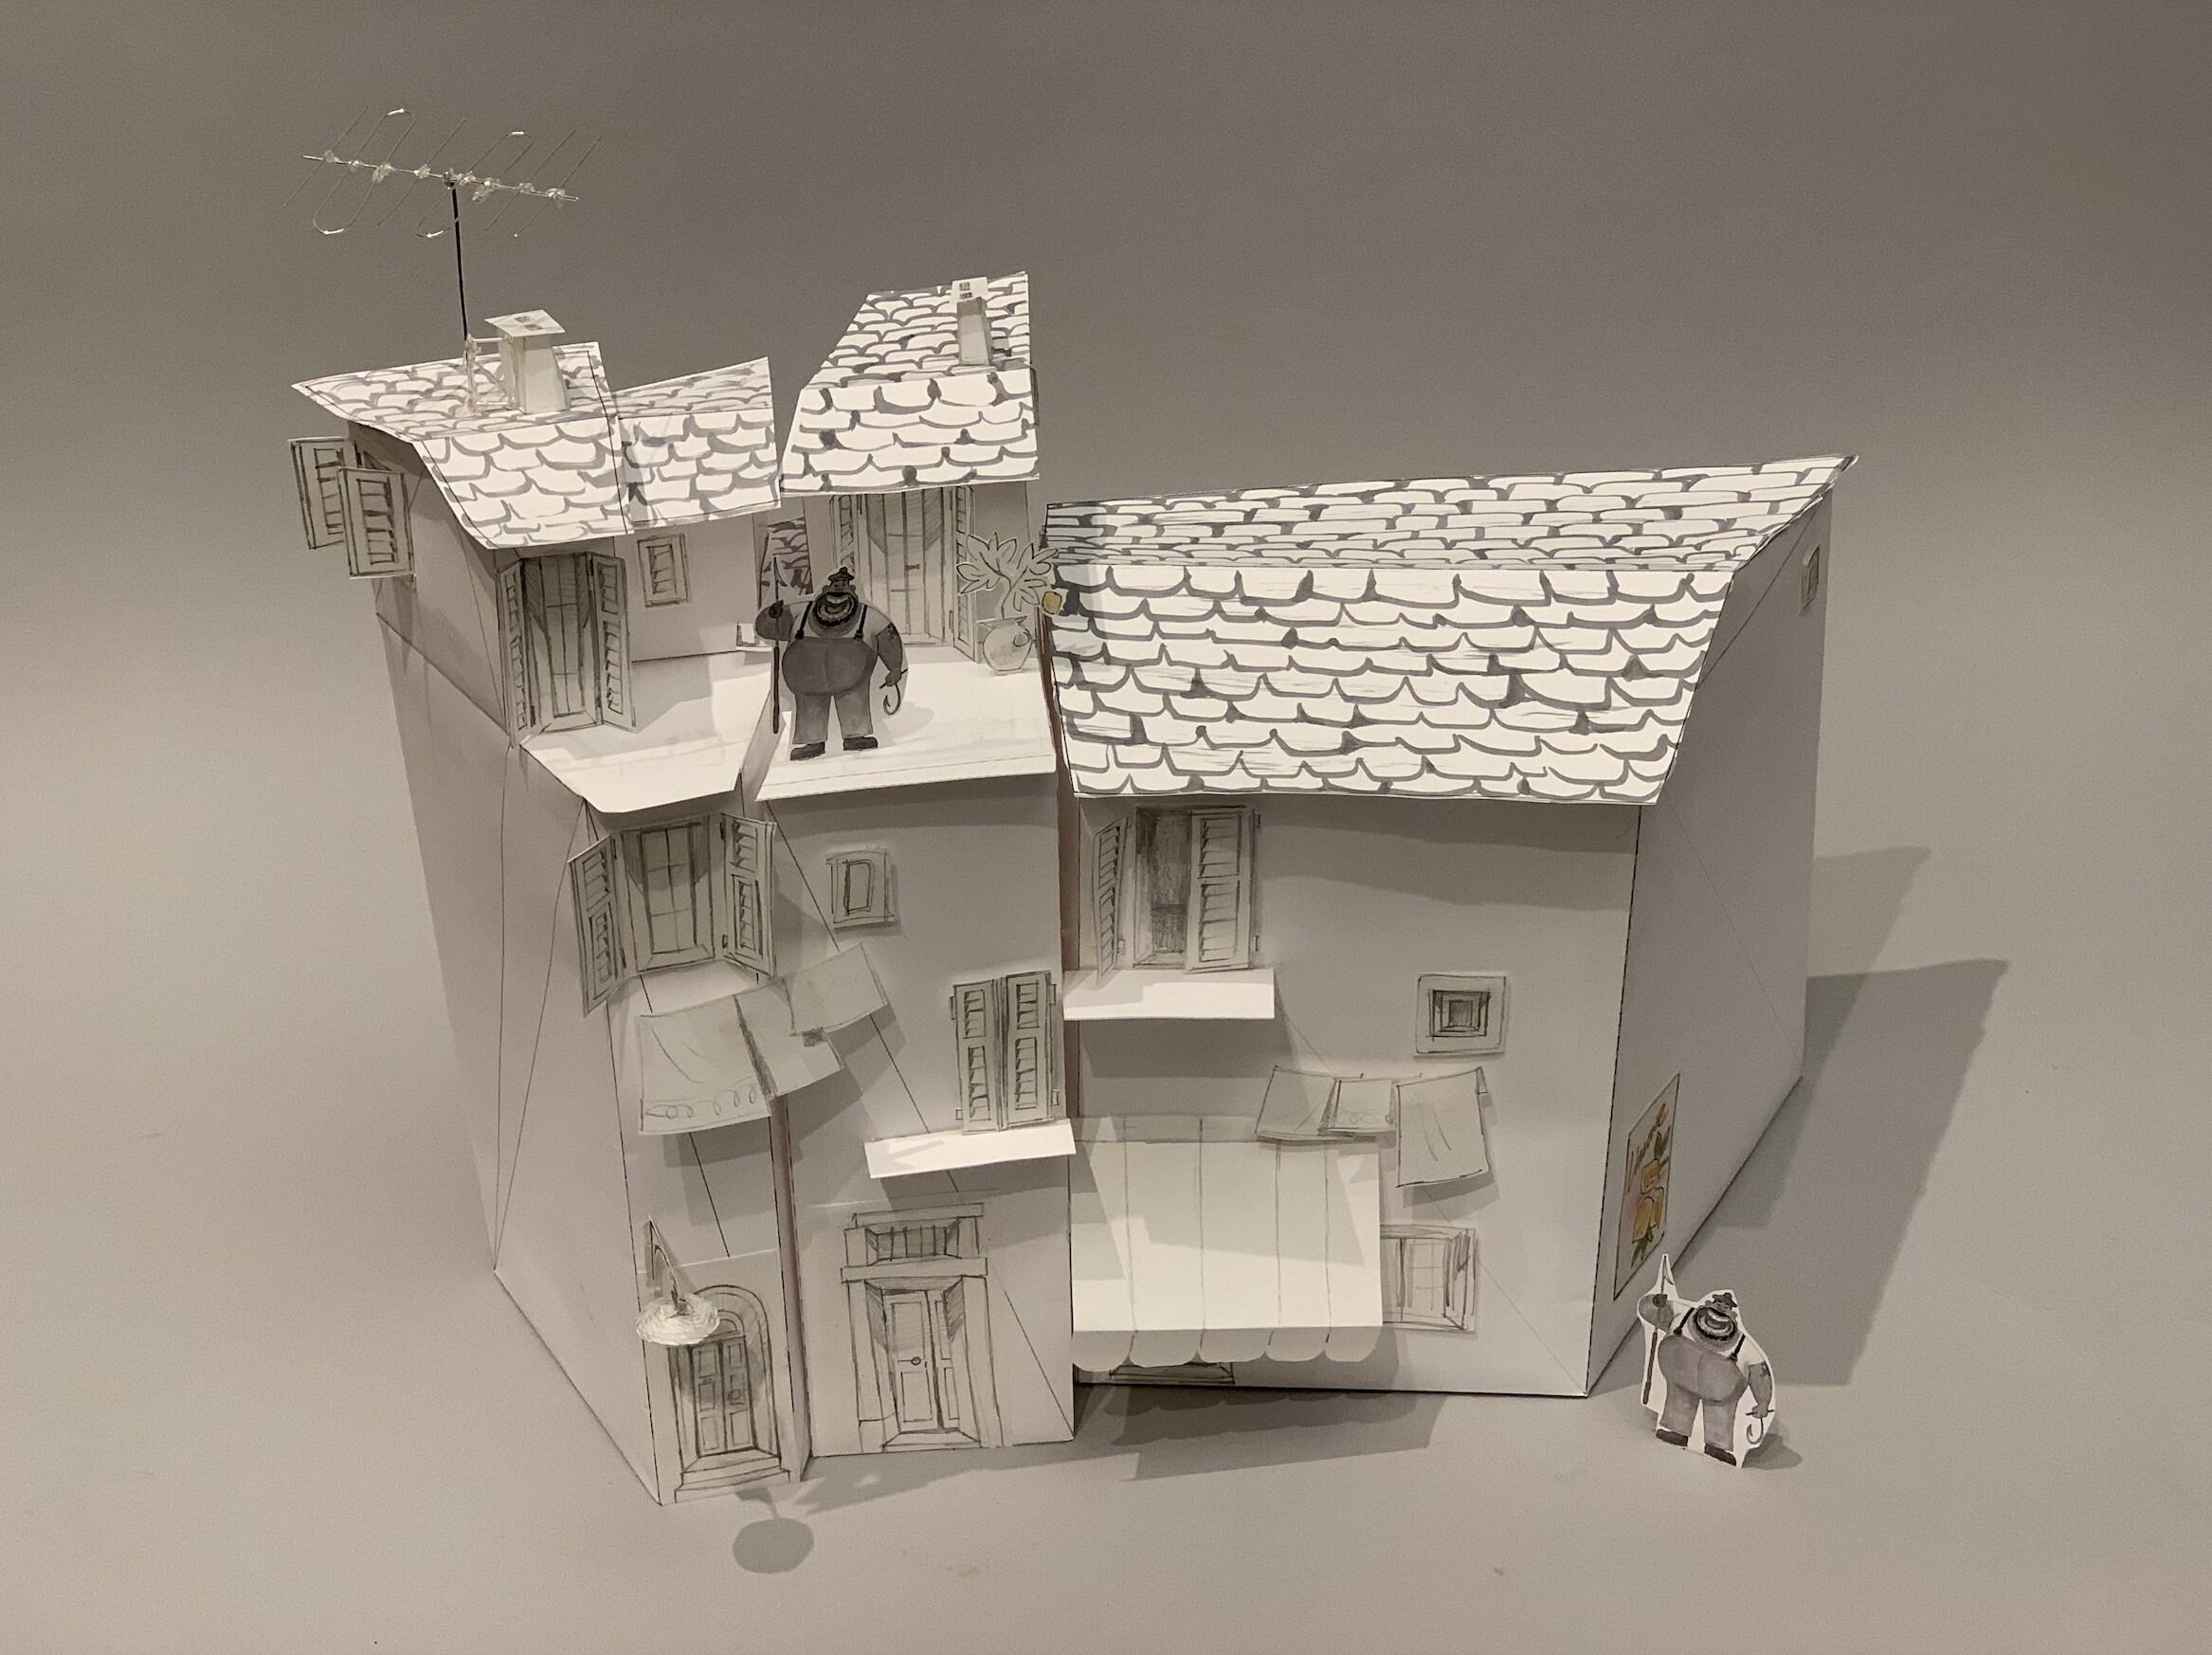 models of buildings in portorosso